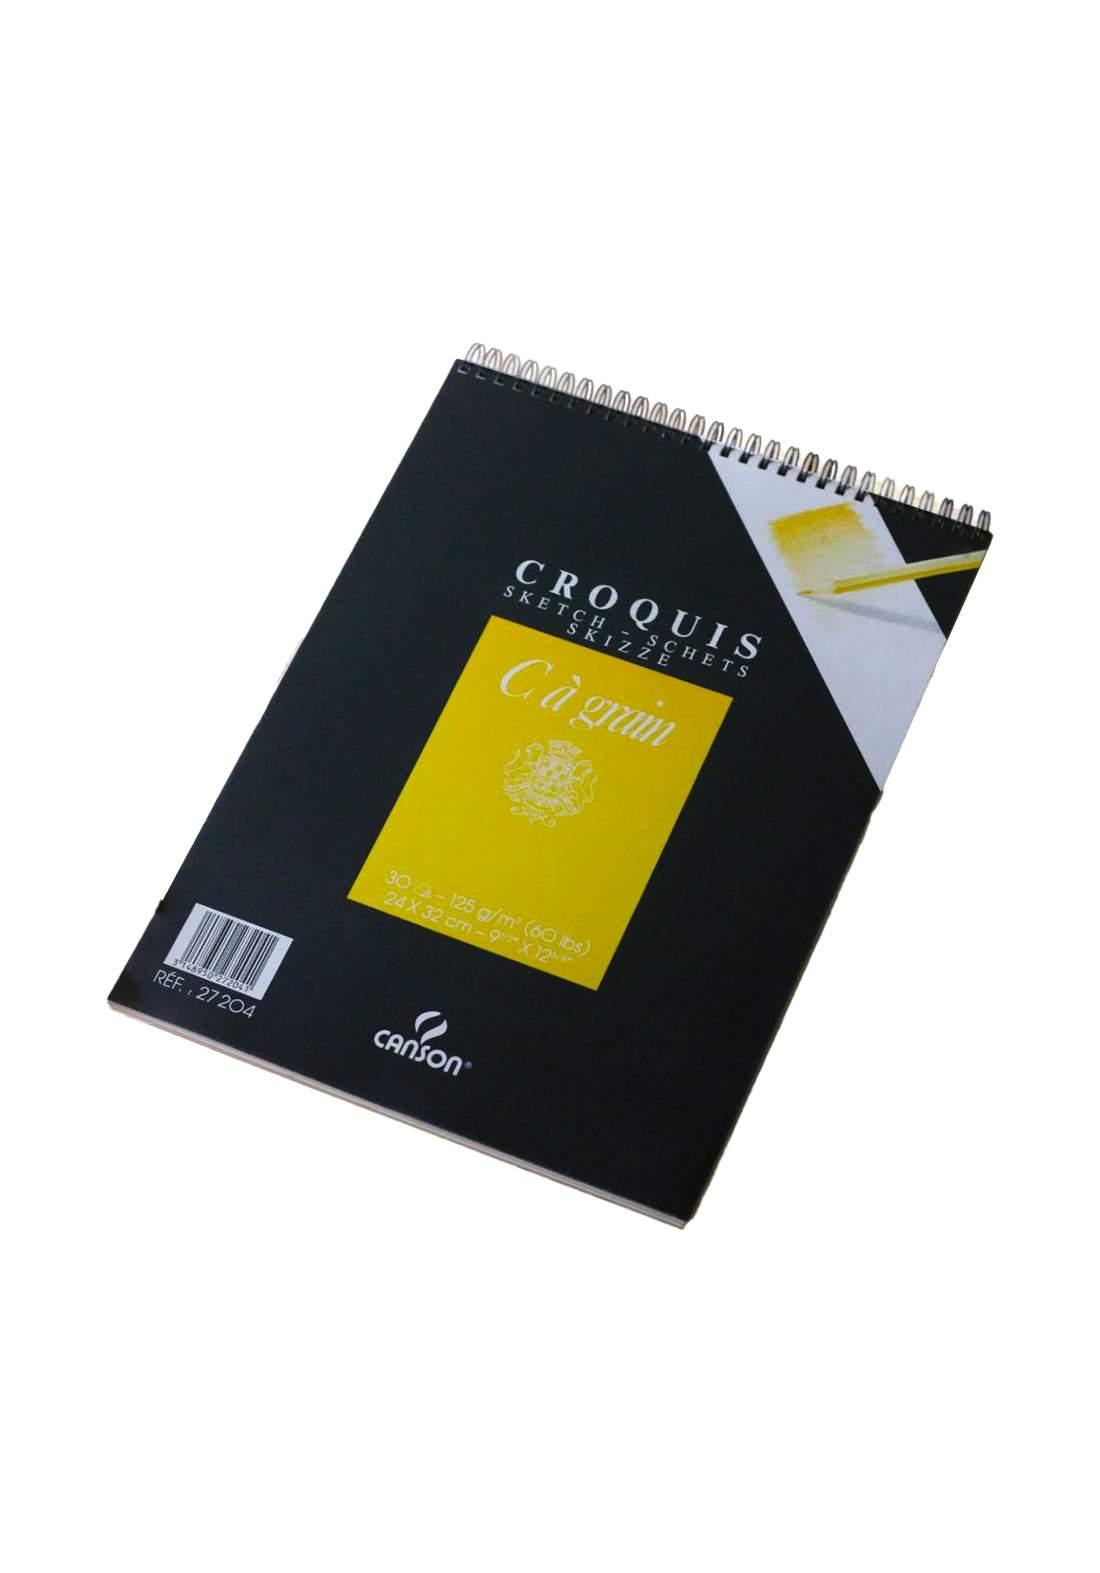 Canson Crouis Sketch دفتر رسم 30 ورقة